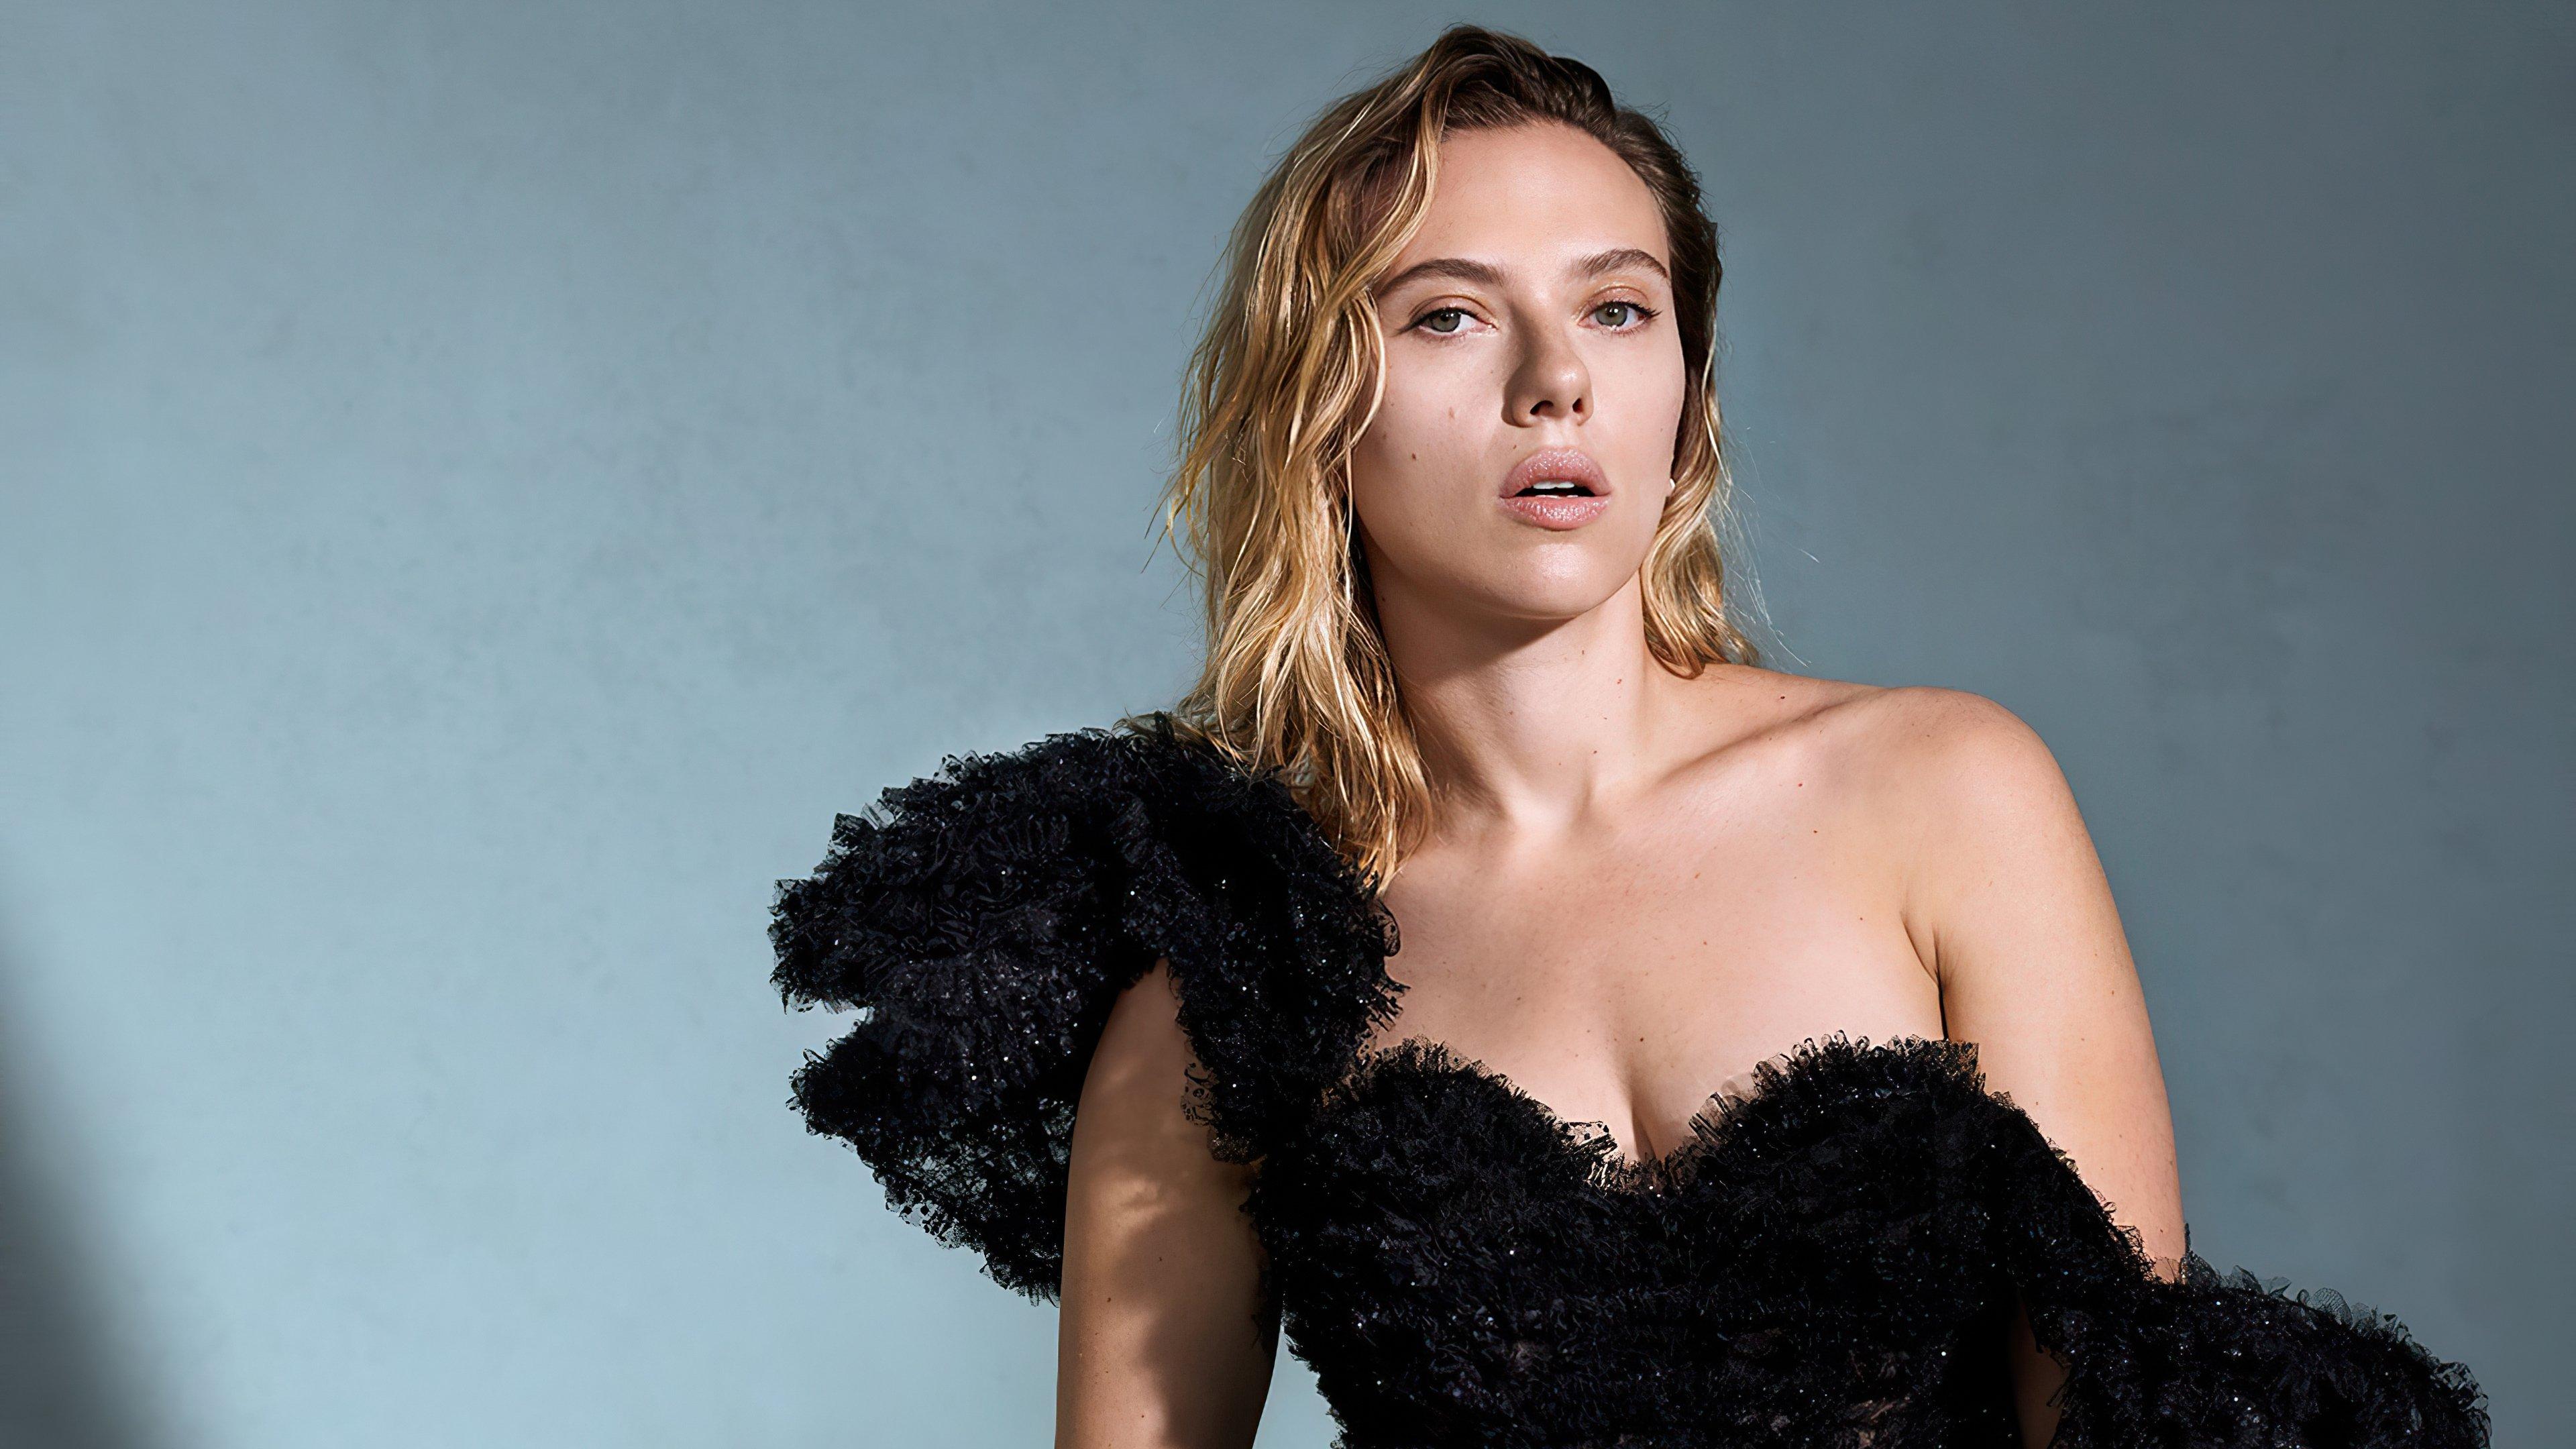 Fondos de pantalla Scarlett Johansson 2020